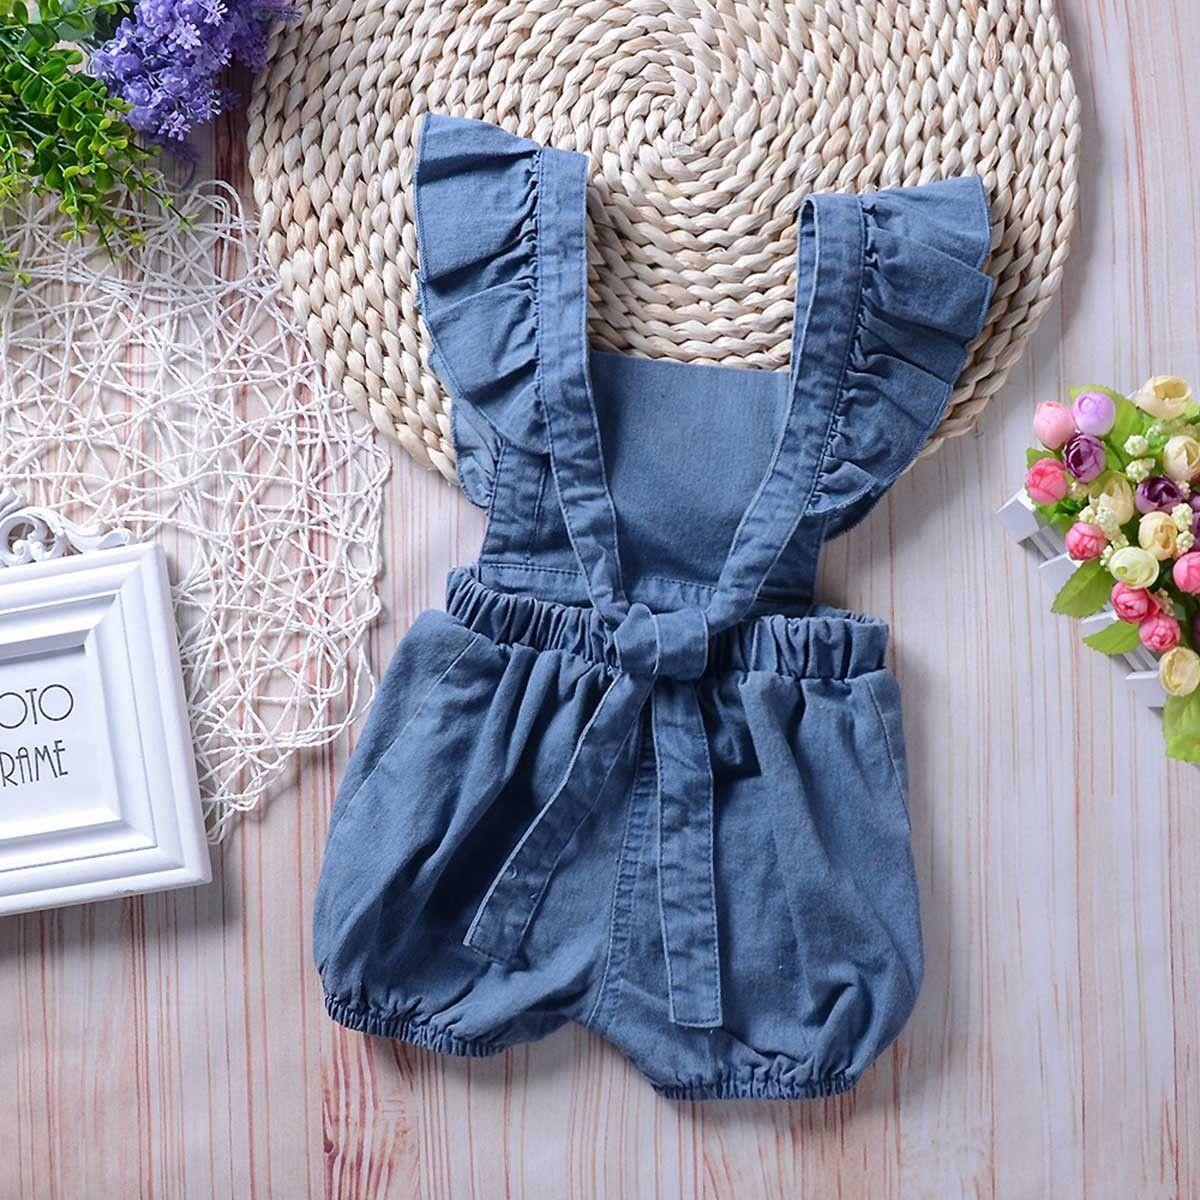 69aa051a5 Newborn Infant Baby Girls Denim Romper Bodysuit Jumpsuit Outfits ...